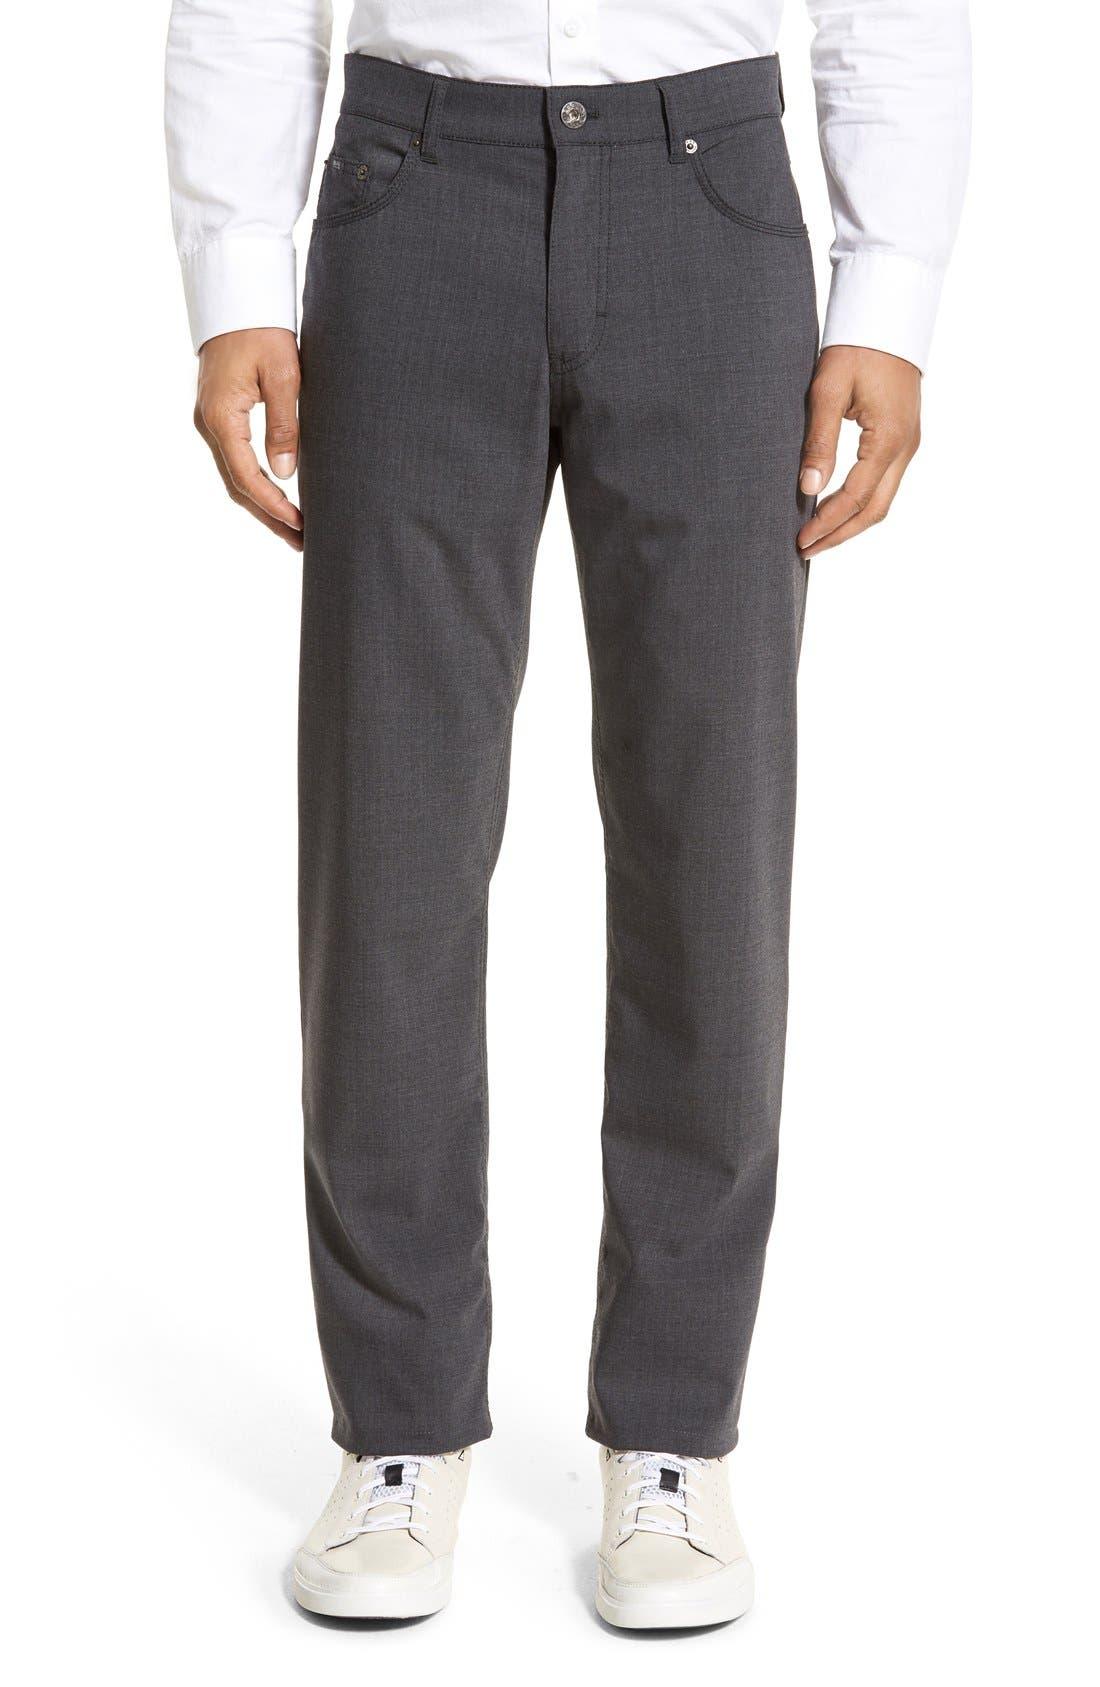 Alternate Image 1 Selected - Brax 'Manager' Five-Pocket Wool Pants